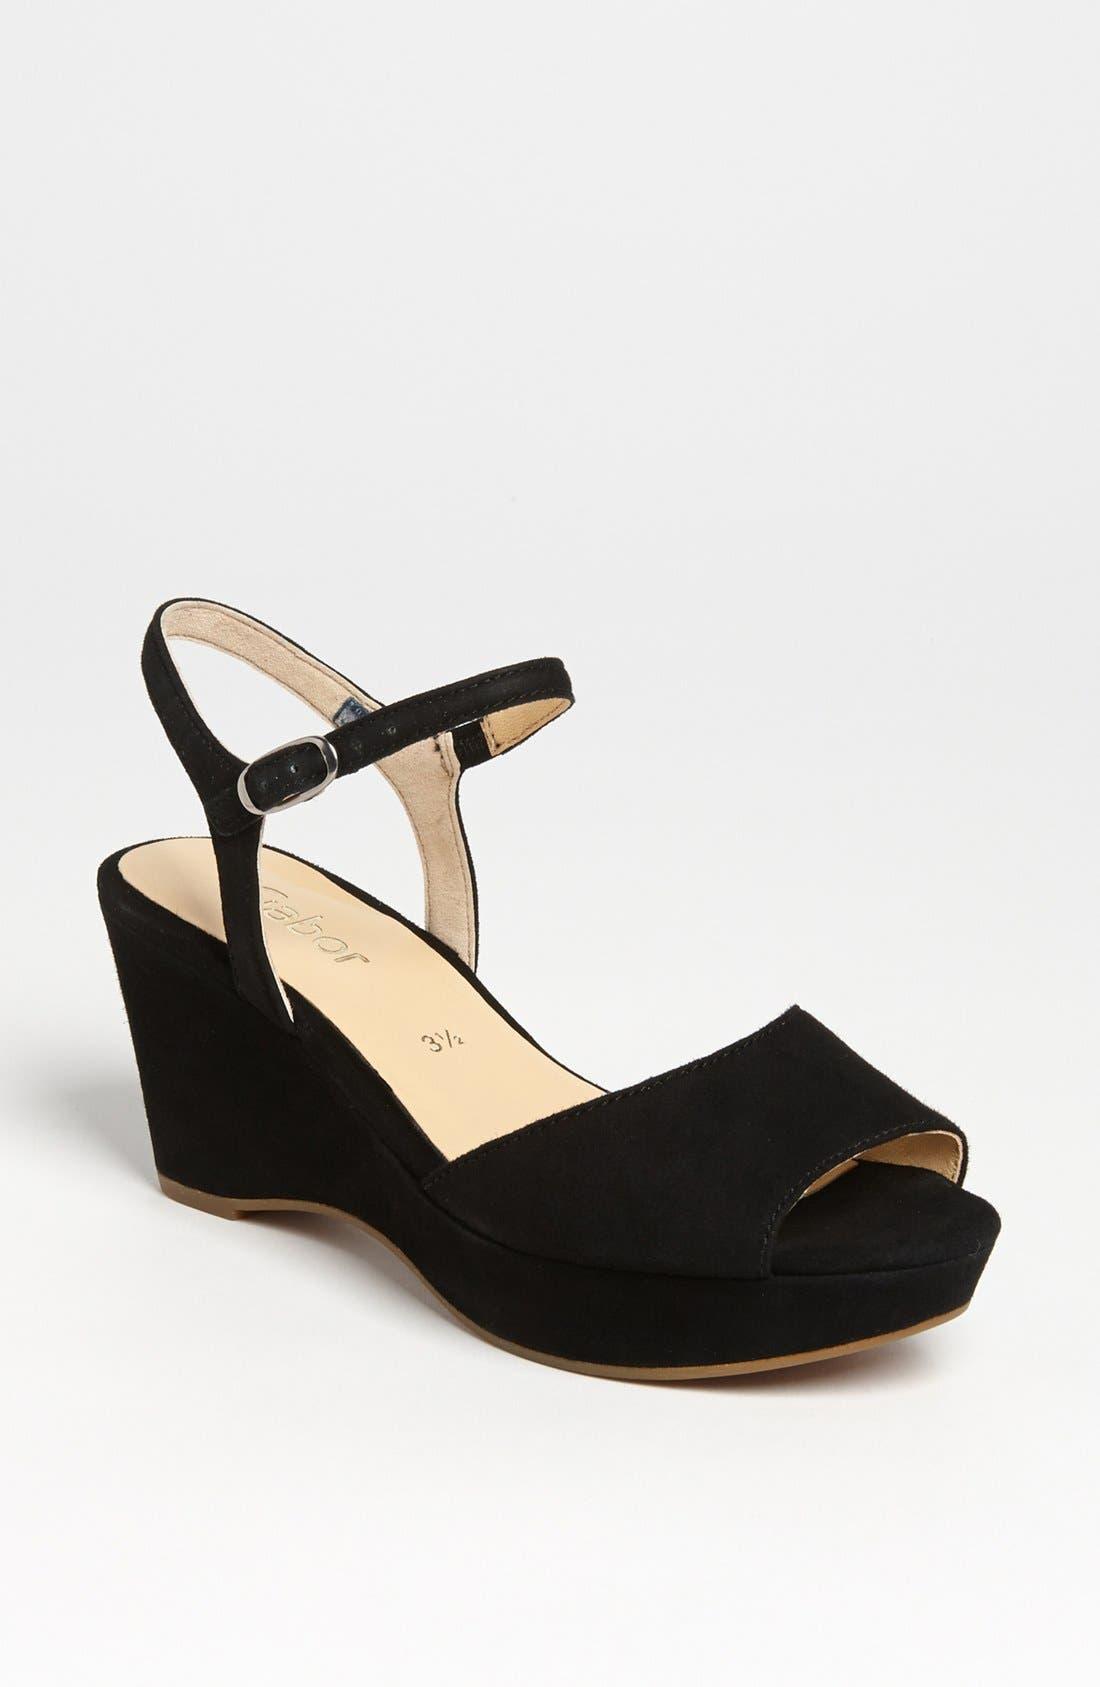 Alternate Image 1 Selected - Gabor Wedge Sandal (Online Only)